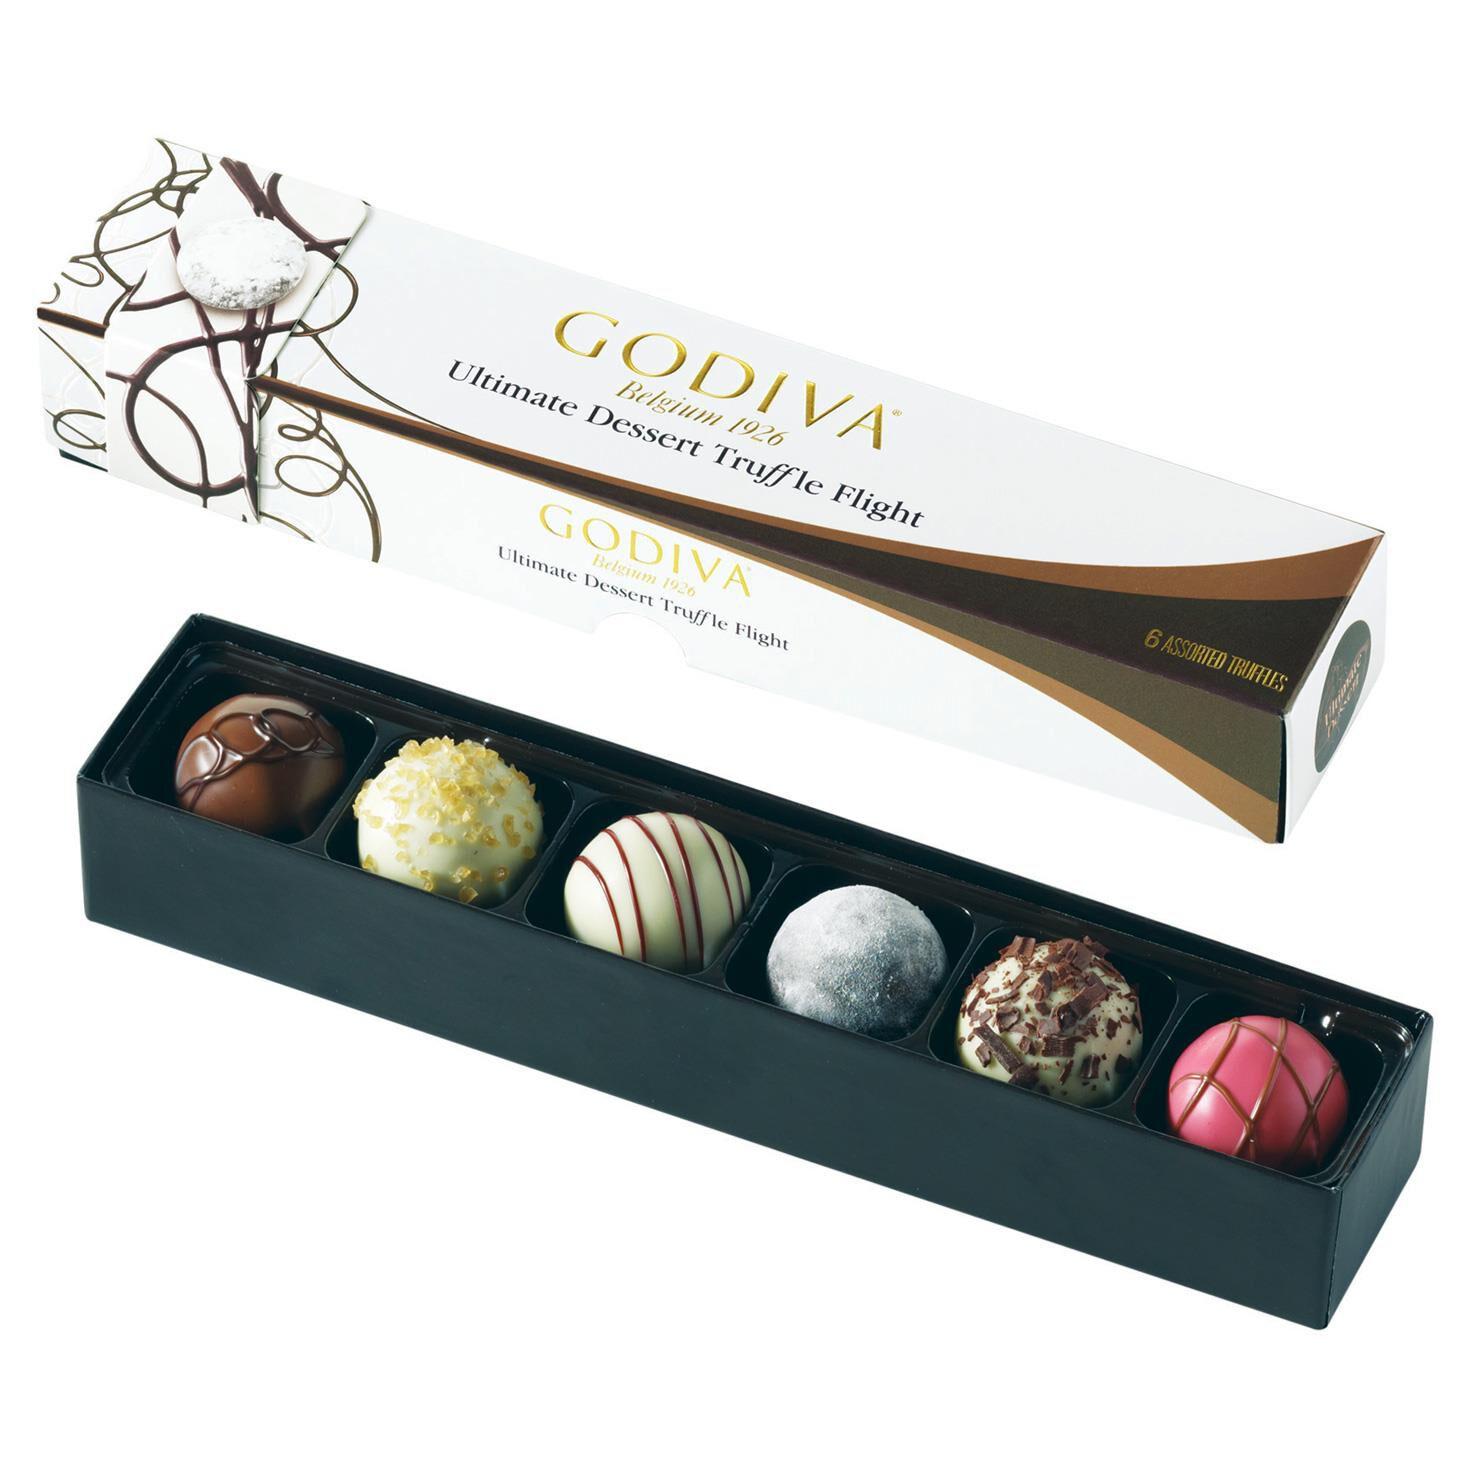 Godiva Chocolatier Ultimate Dessert Truffle Flight In Box